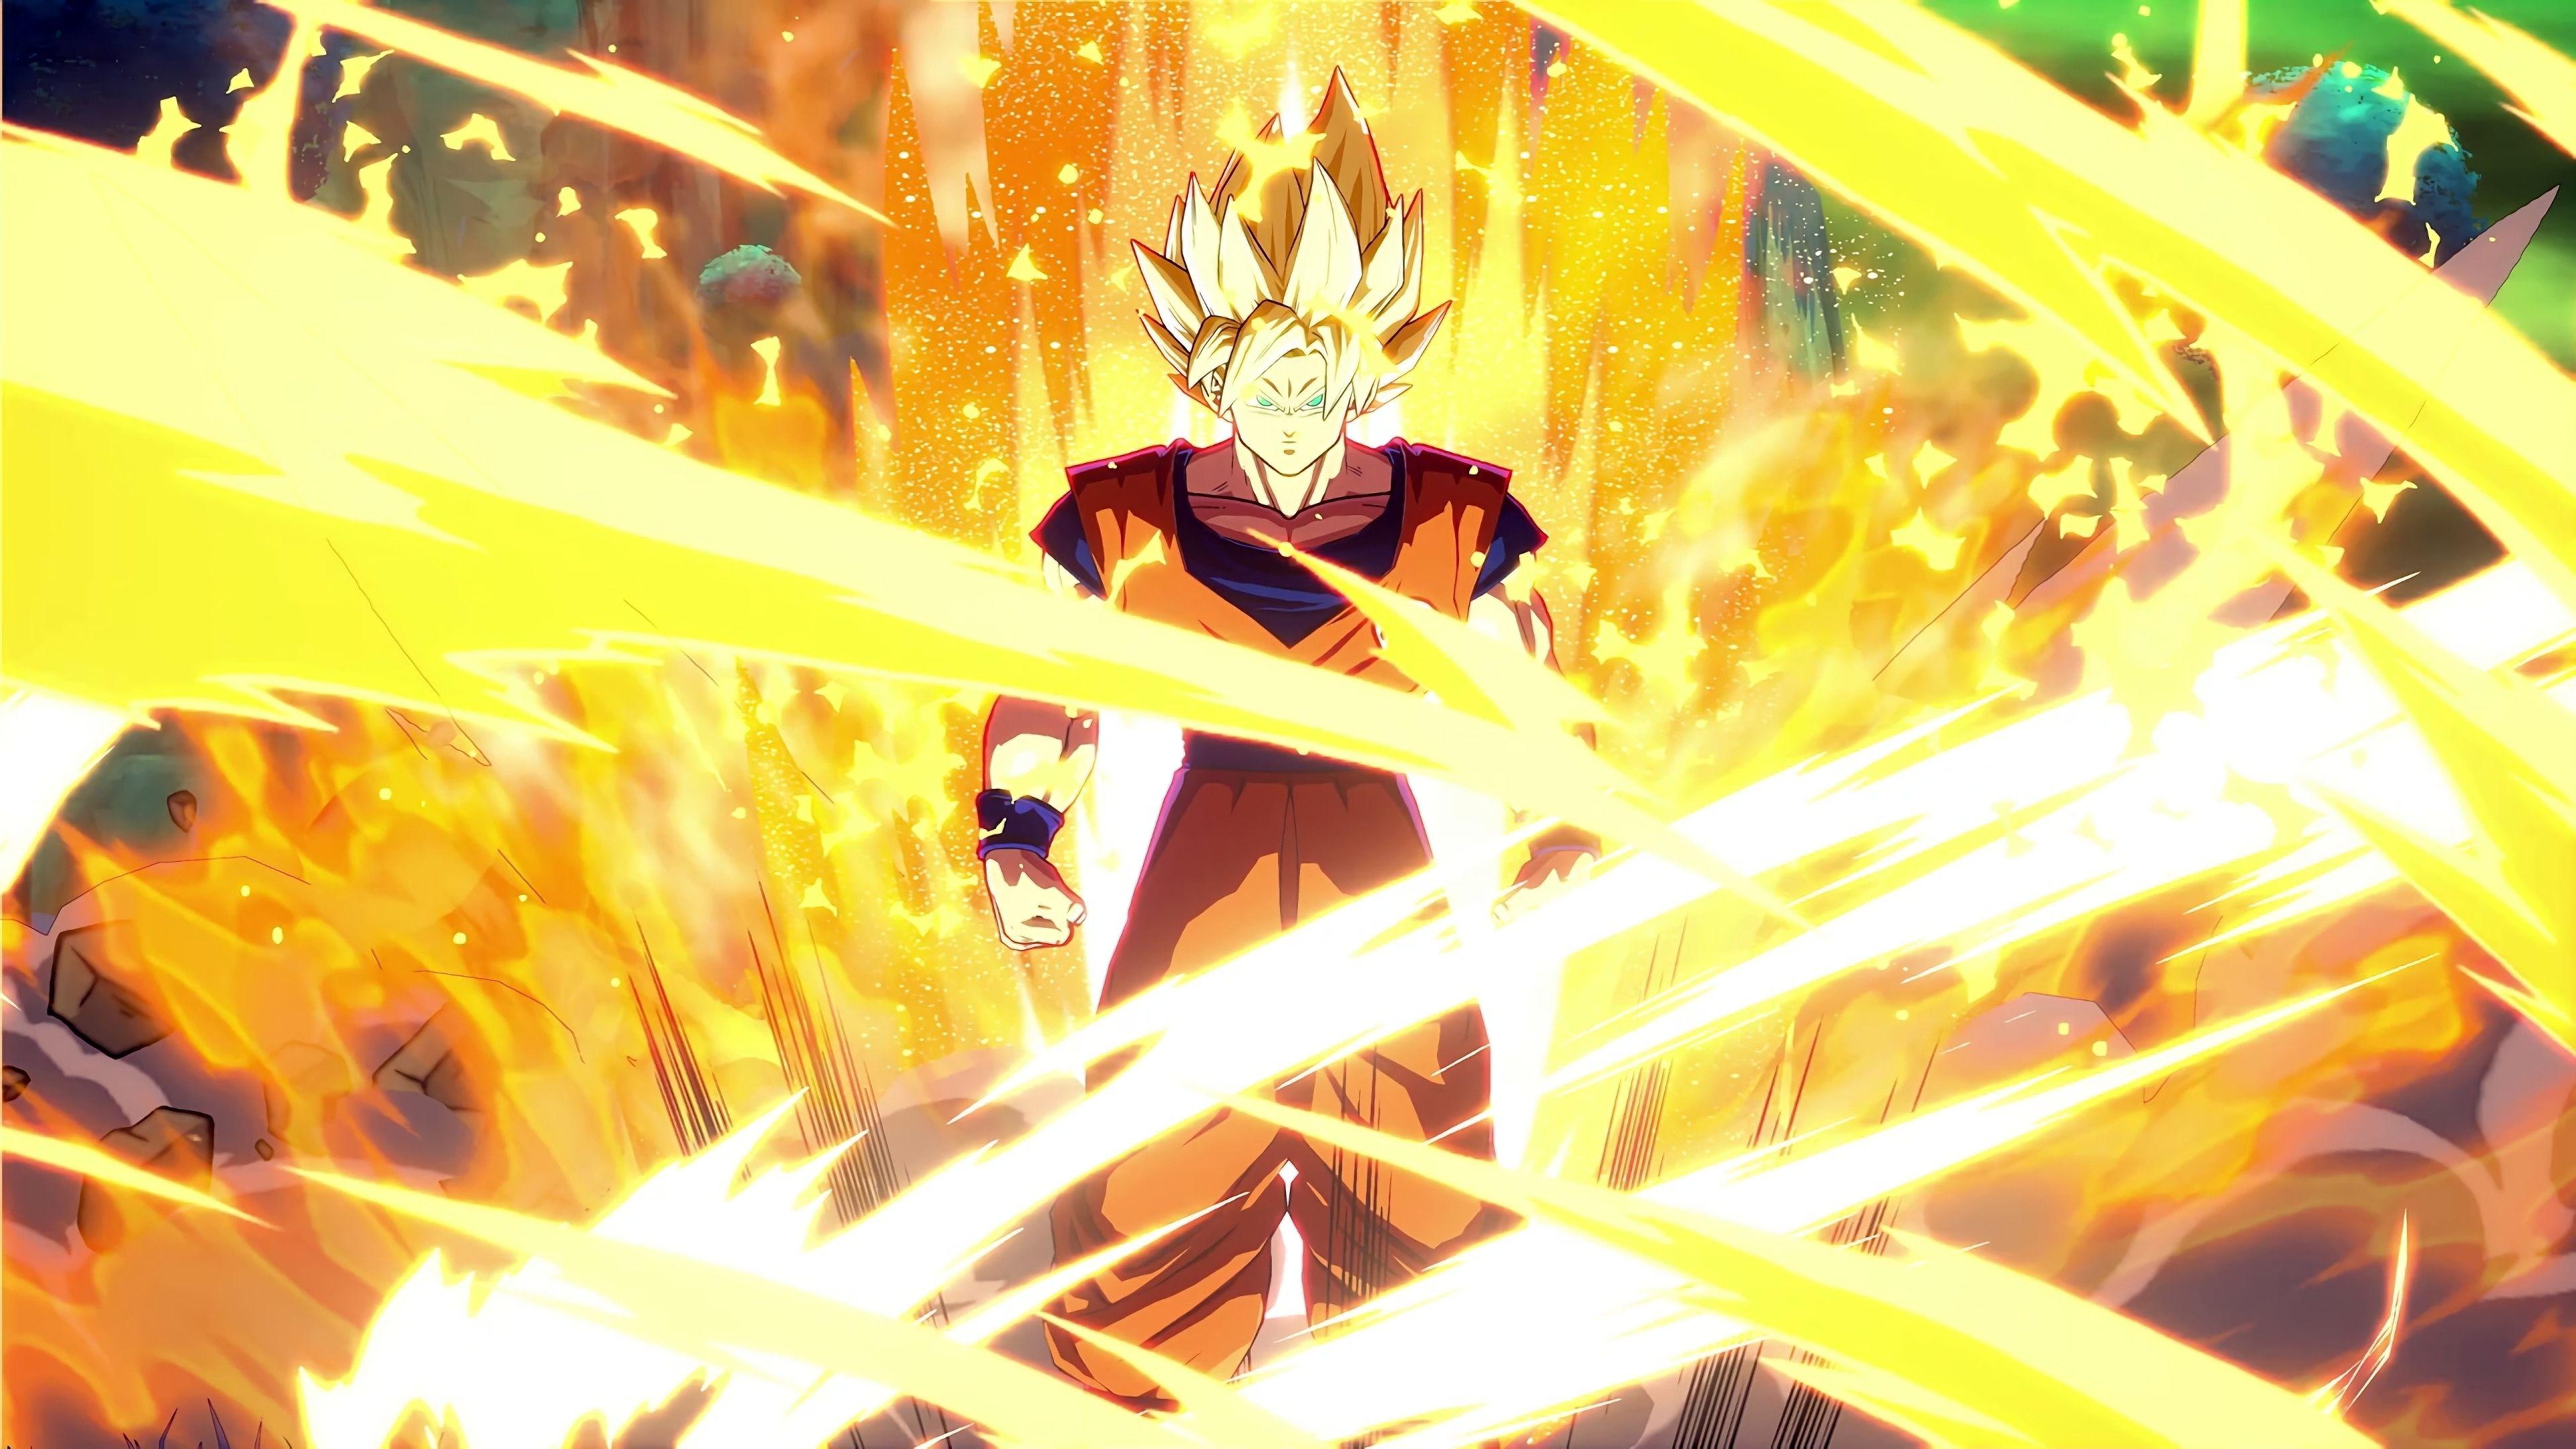 Ideas For Goku Super Saiyan 2 4k Wallpaper Pictures In 2020 Goku